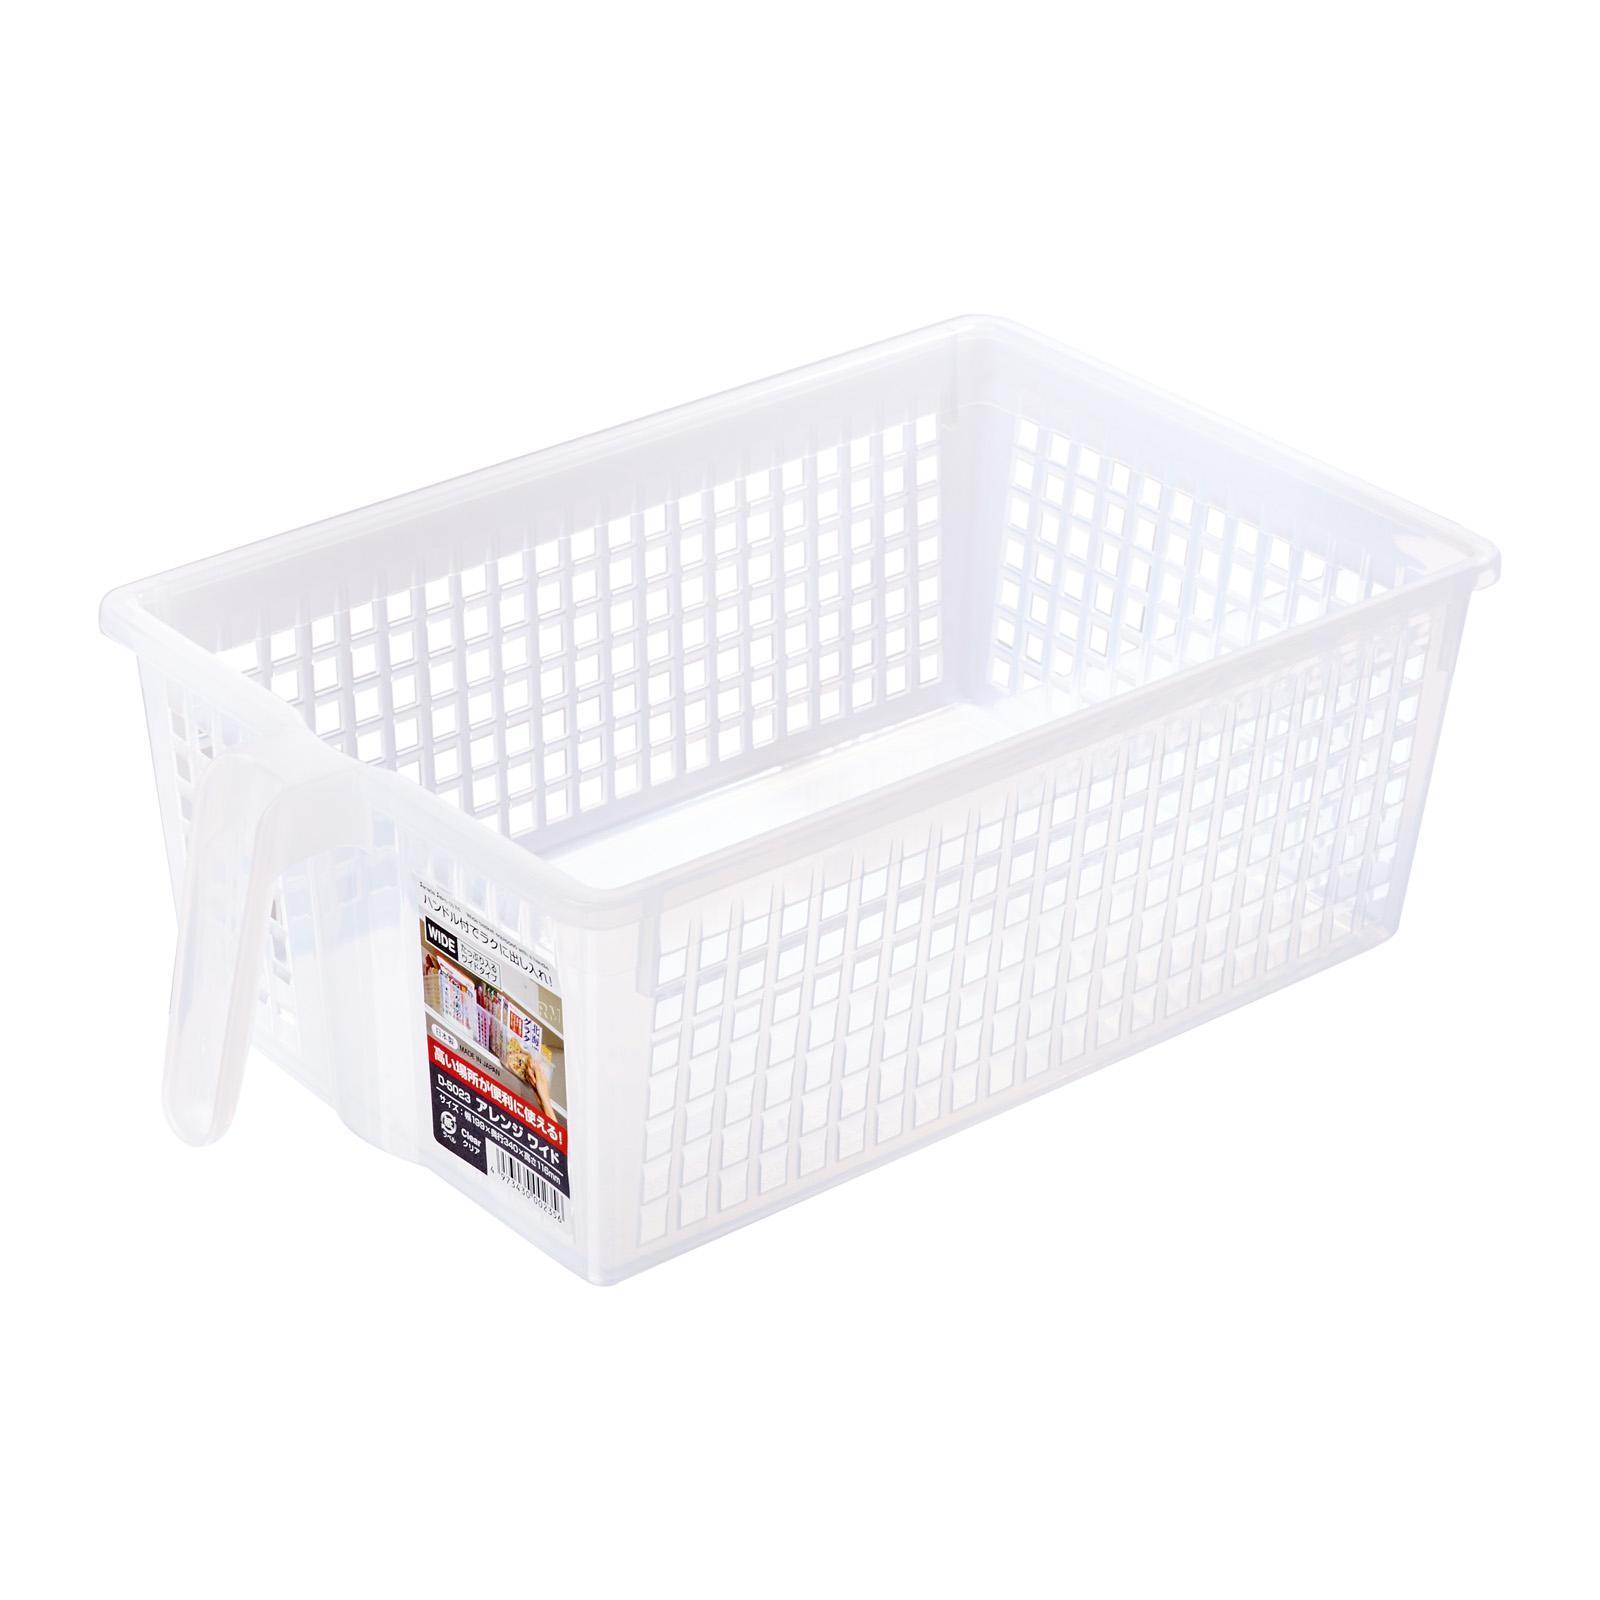 Sanada Seiko Storage Basket with Handle/Wide Clear